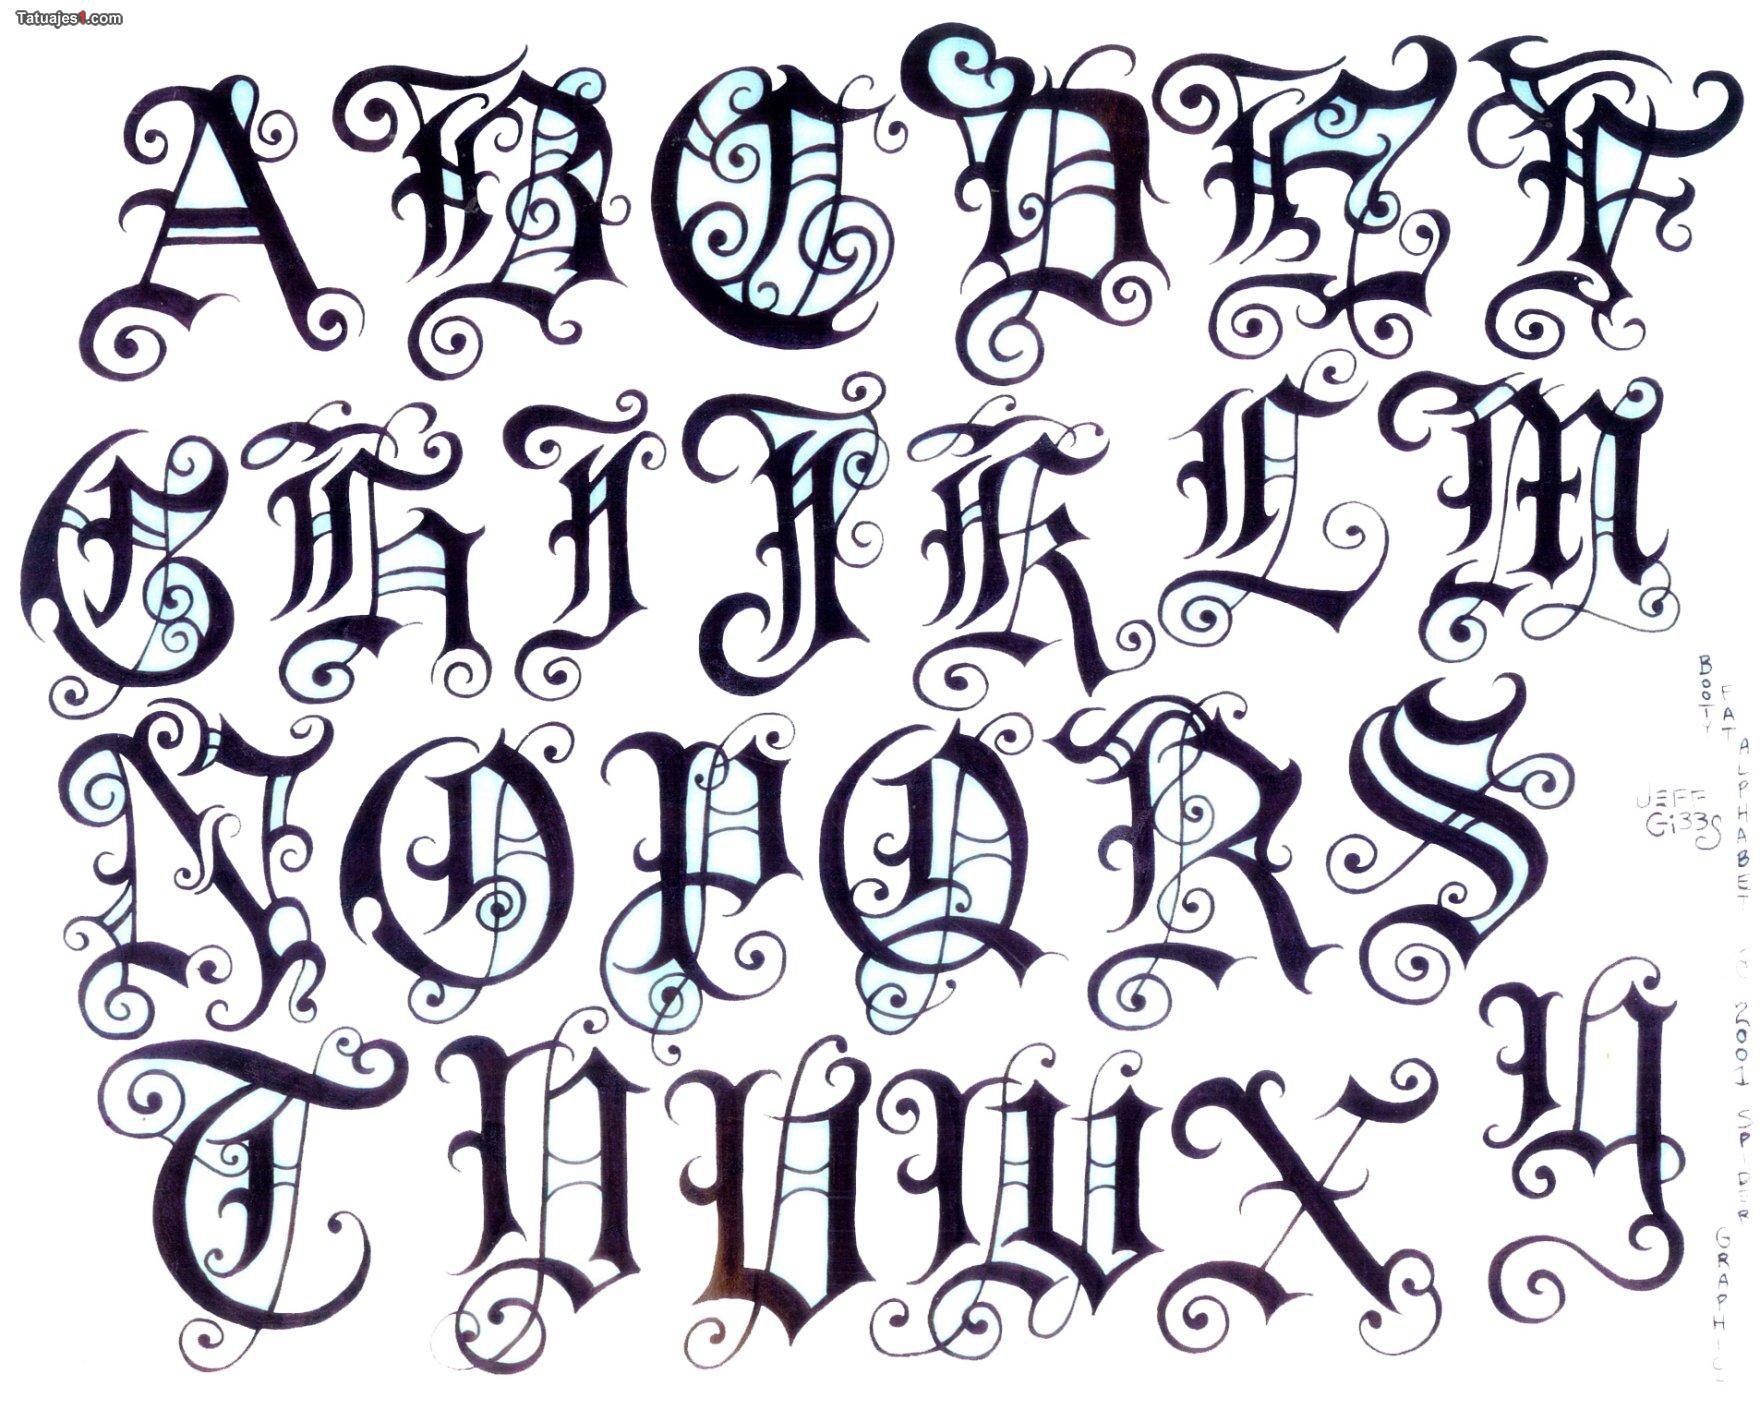 Imagen De Http Www Tatuajes1 Com Thumb Grande Textos Letras Goticas 1519 Jpg Tattoo Lettering Styles Lettering Alphabet Lettering Design